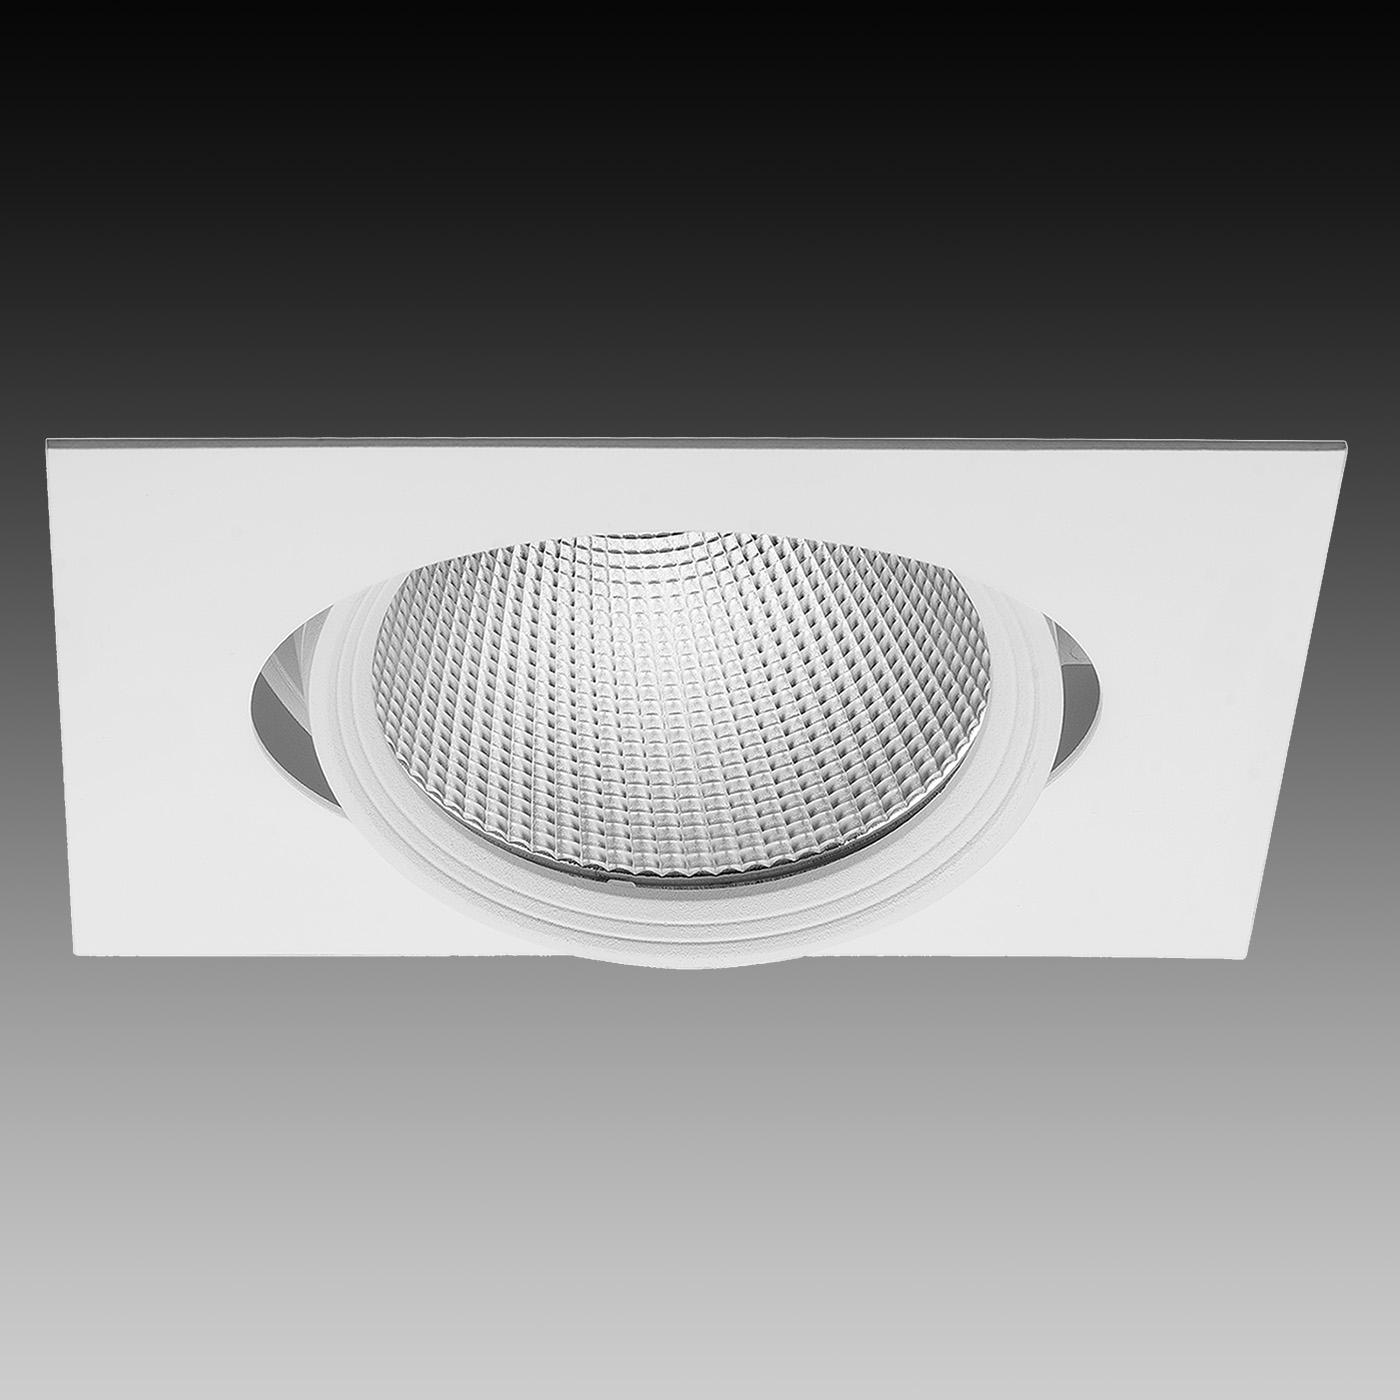 PRIDE | LAMP83 - Effiziente Beleuchtungssysteme